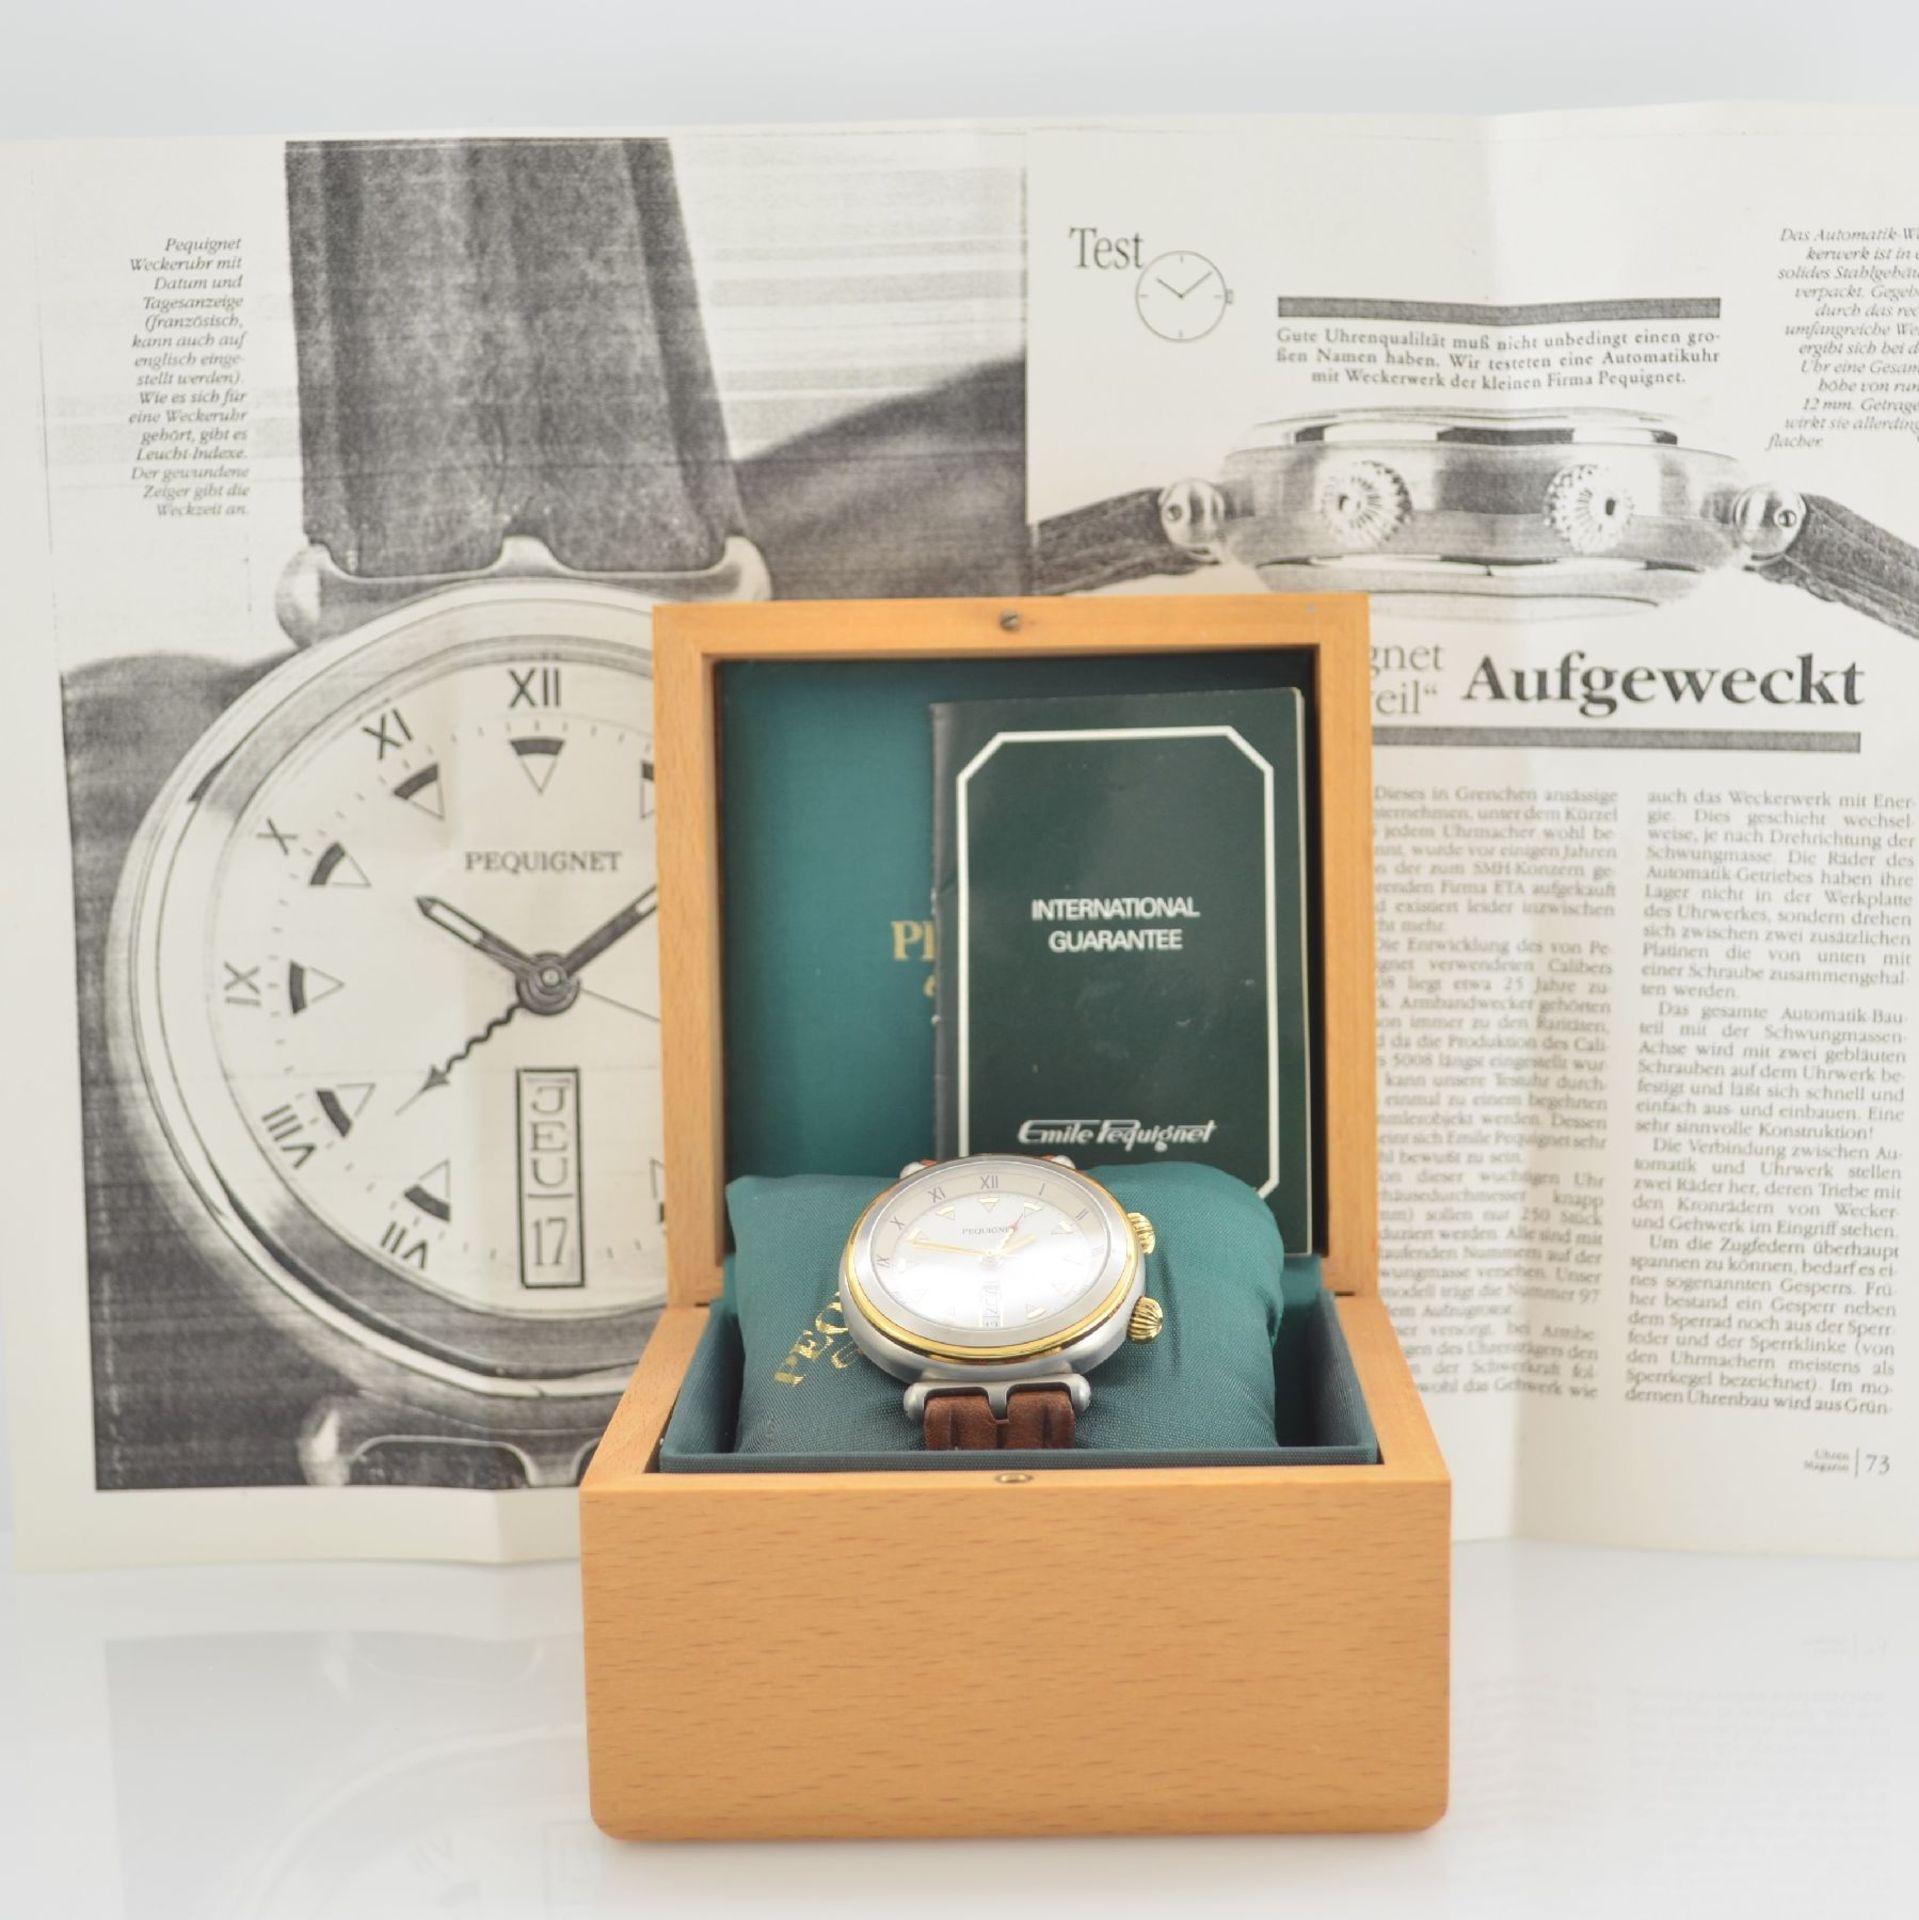 BUCHERER Chronometer Herrenarmbanduhr Archimedes in Edelstahl, Automatik, Gliederband m. dopp. - Bild 7 aus 7